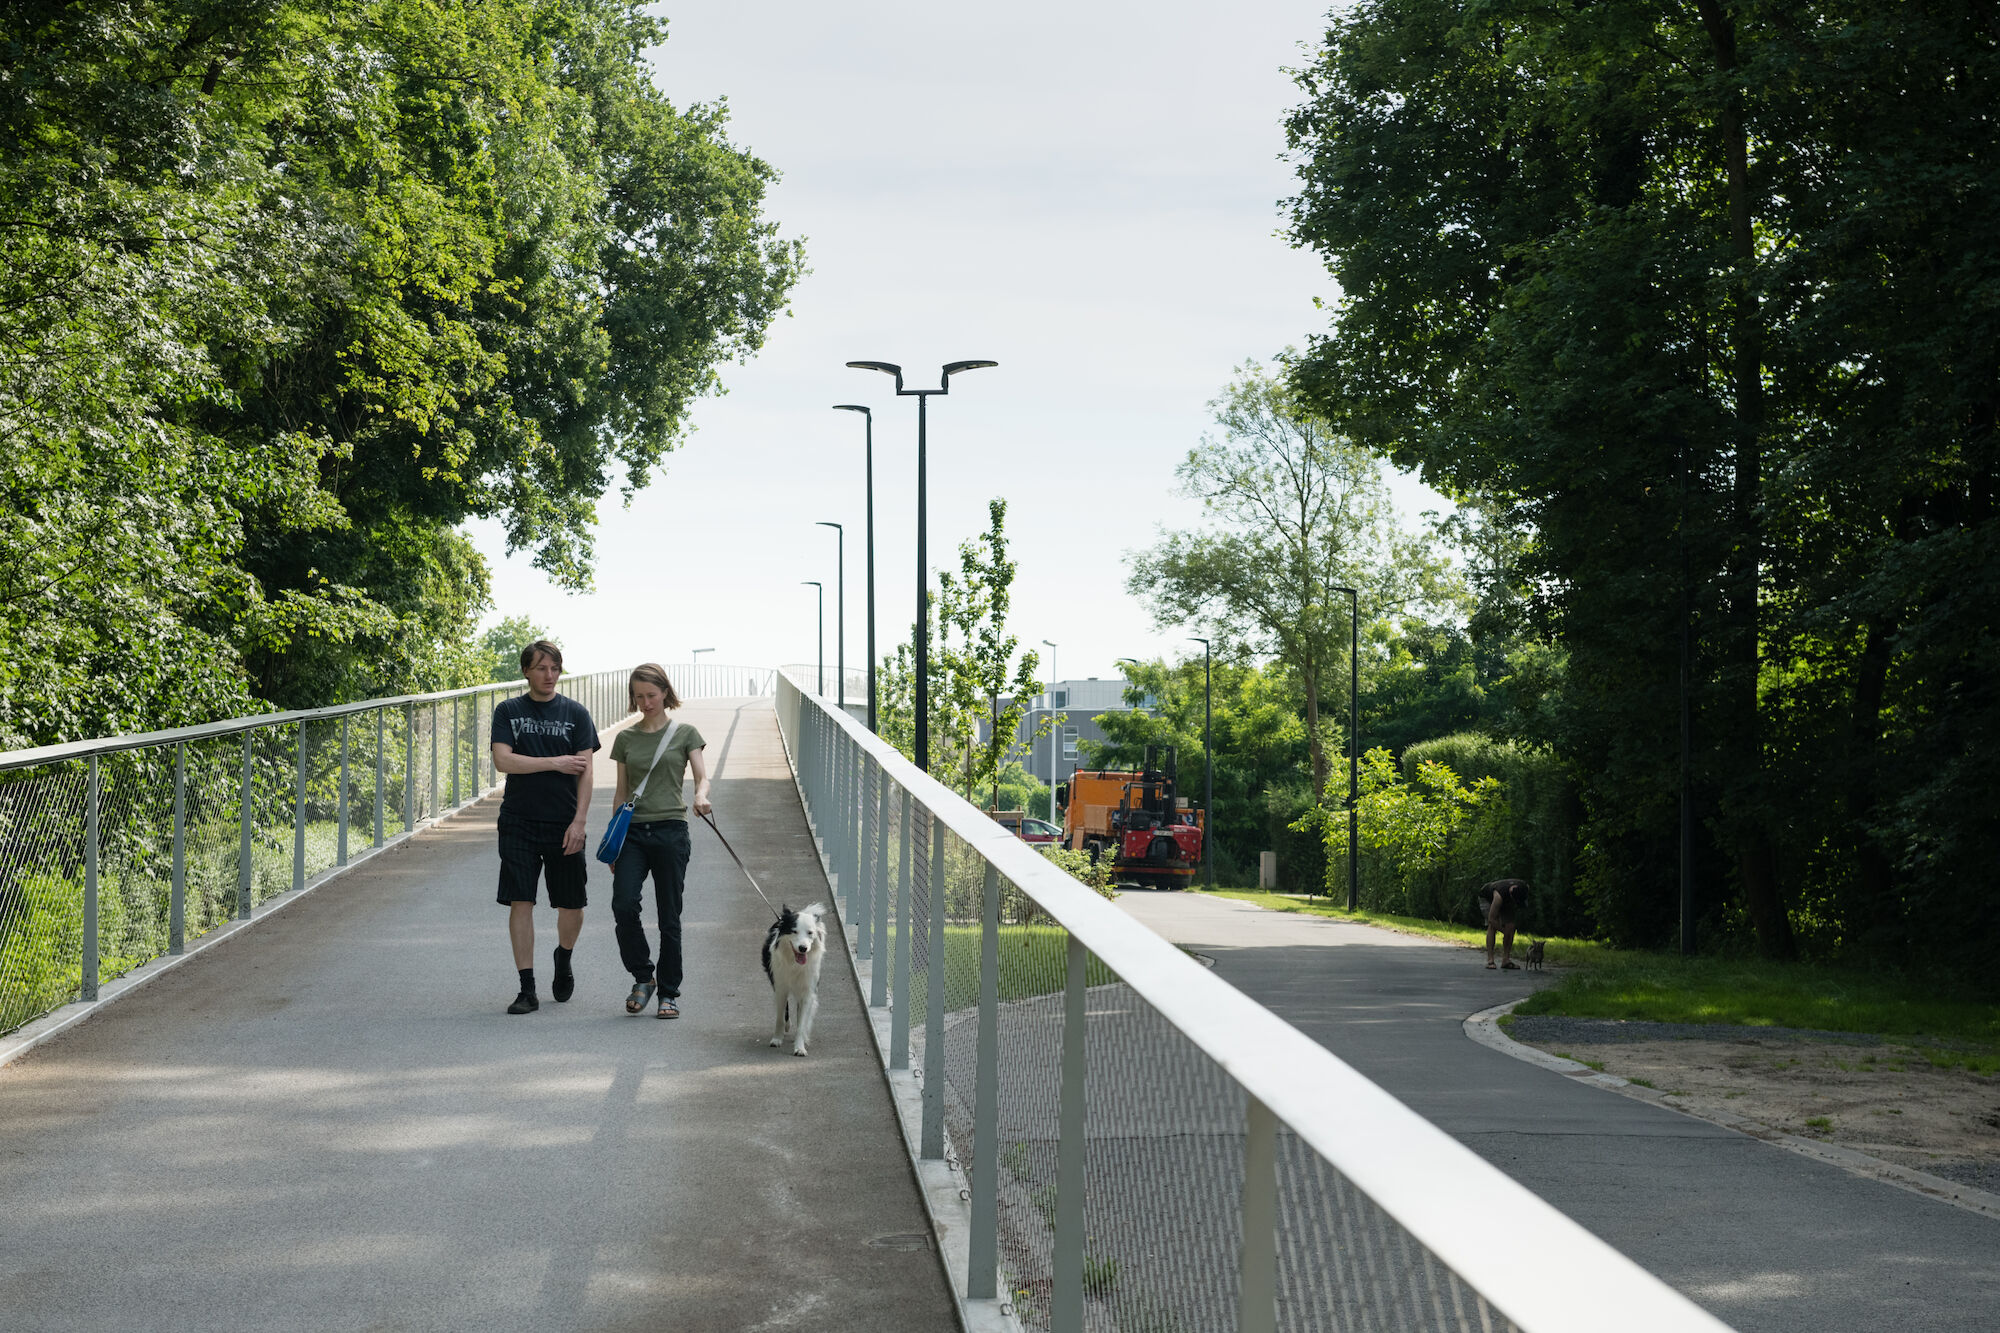 de parkbosbruggen (fiets- en wandelbruggen)